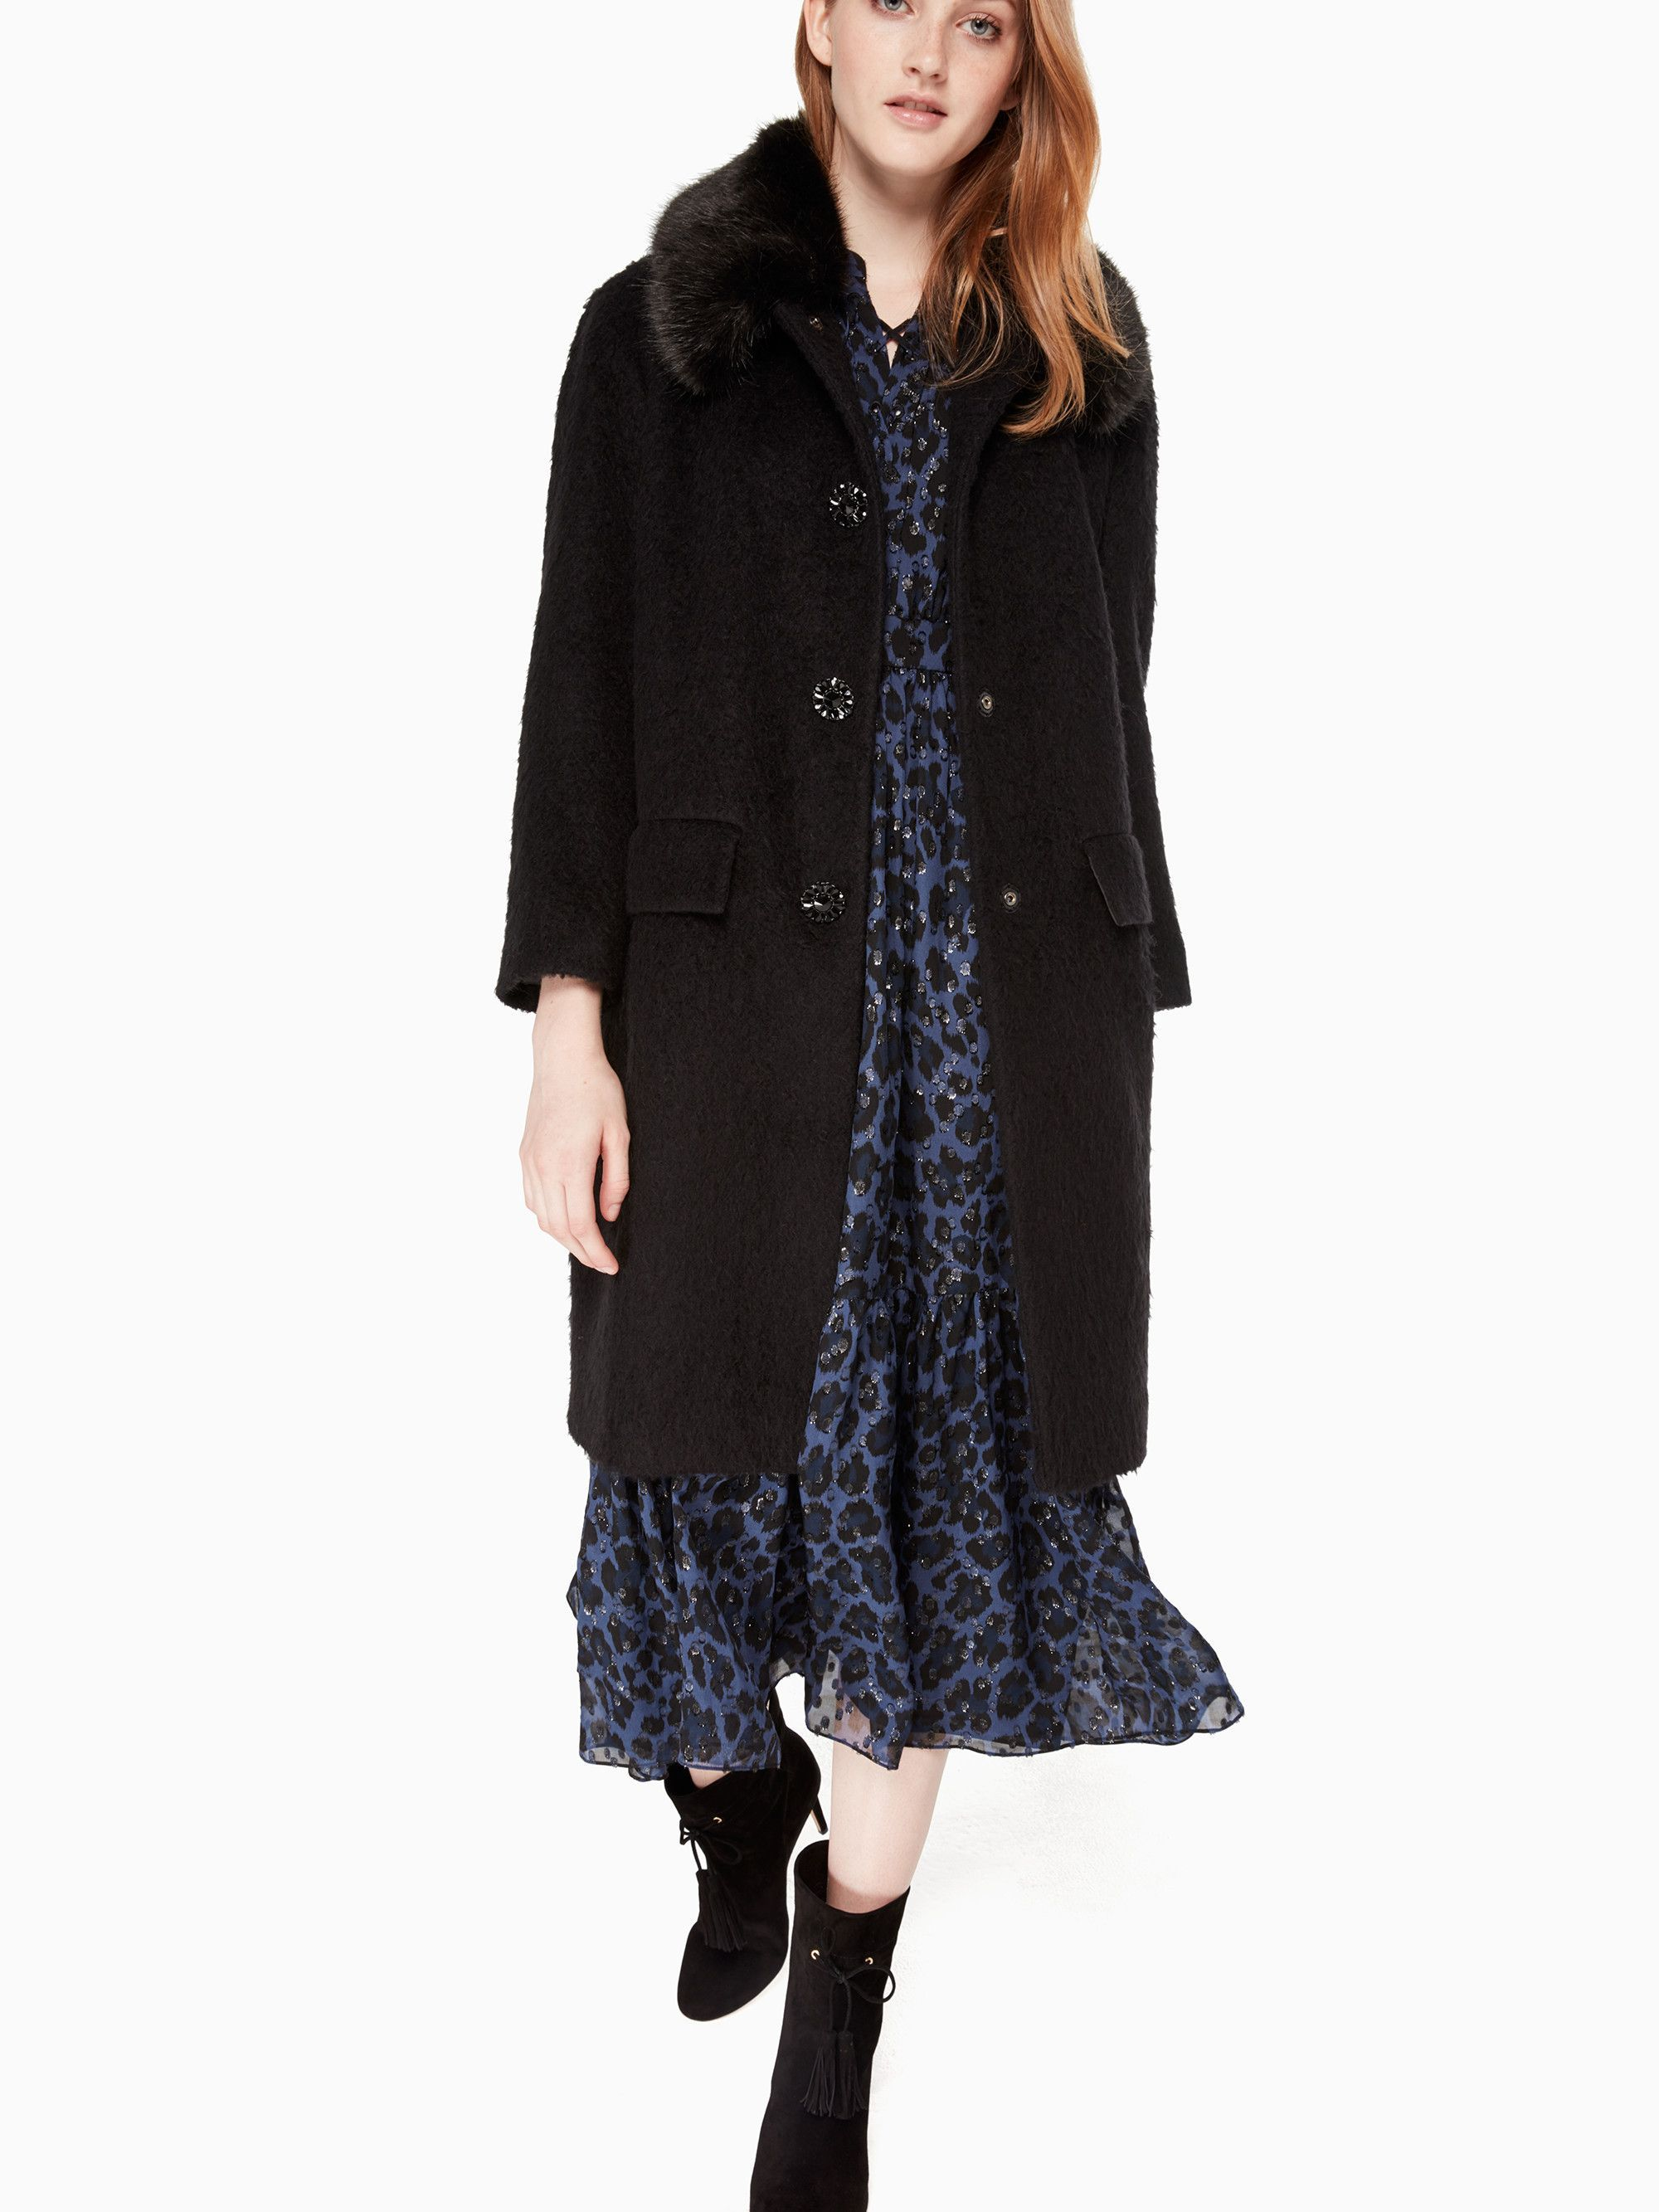 cd157f06e A classic Tweed Coat, Vest Jacket, Winter Wardrobe Essentials, Wardrobe  Staples, Cheap